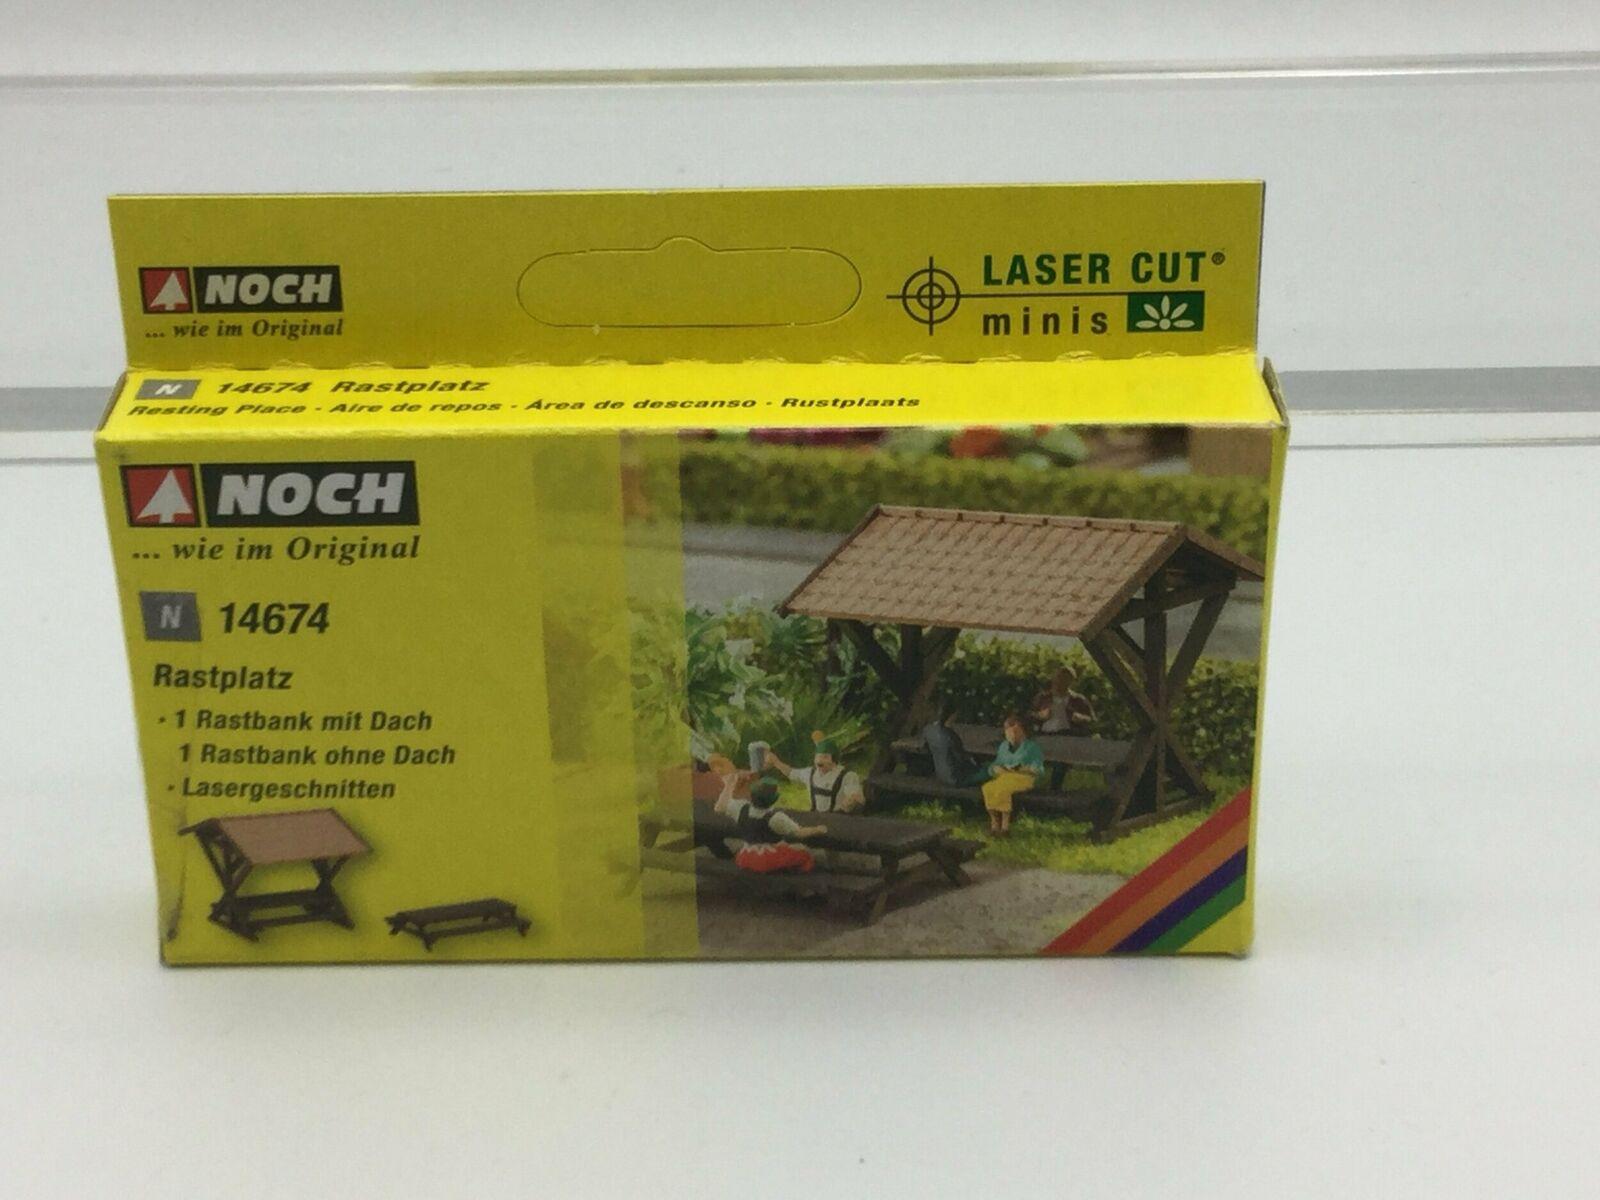 NOCH Resting Place Laser Cut Minis Kit HO Gauge Scenics 14674